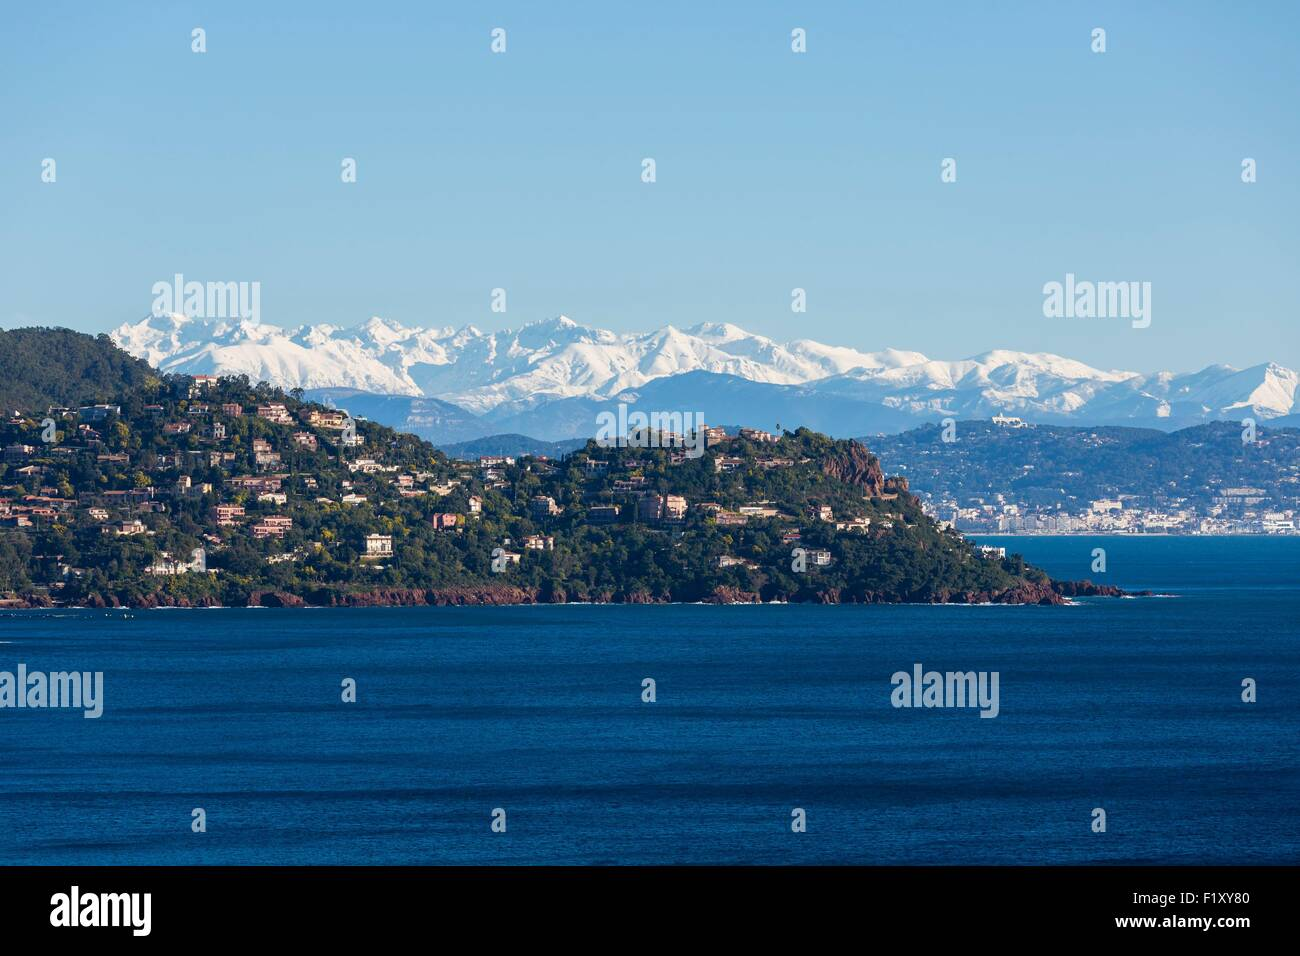 Francia, Alpes Maritimes, en Theoule sur Mer, Golfo de Napoule, Cannes y montañas nevadas de Mercantour en Imagen De Stock